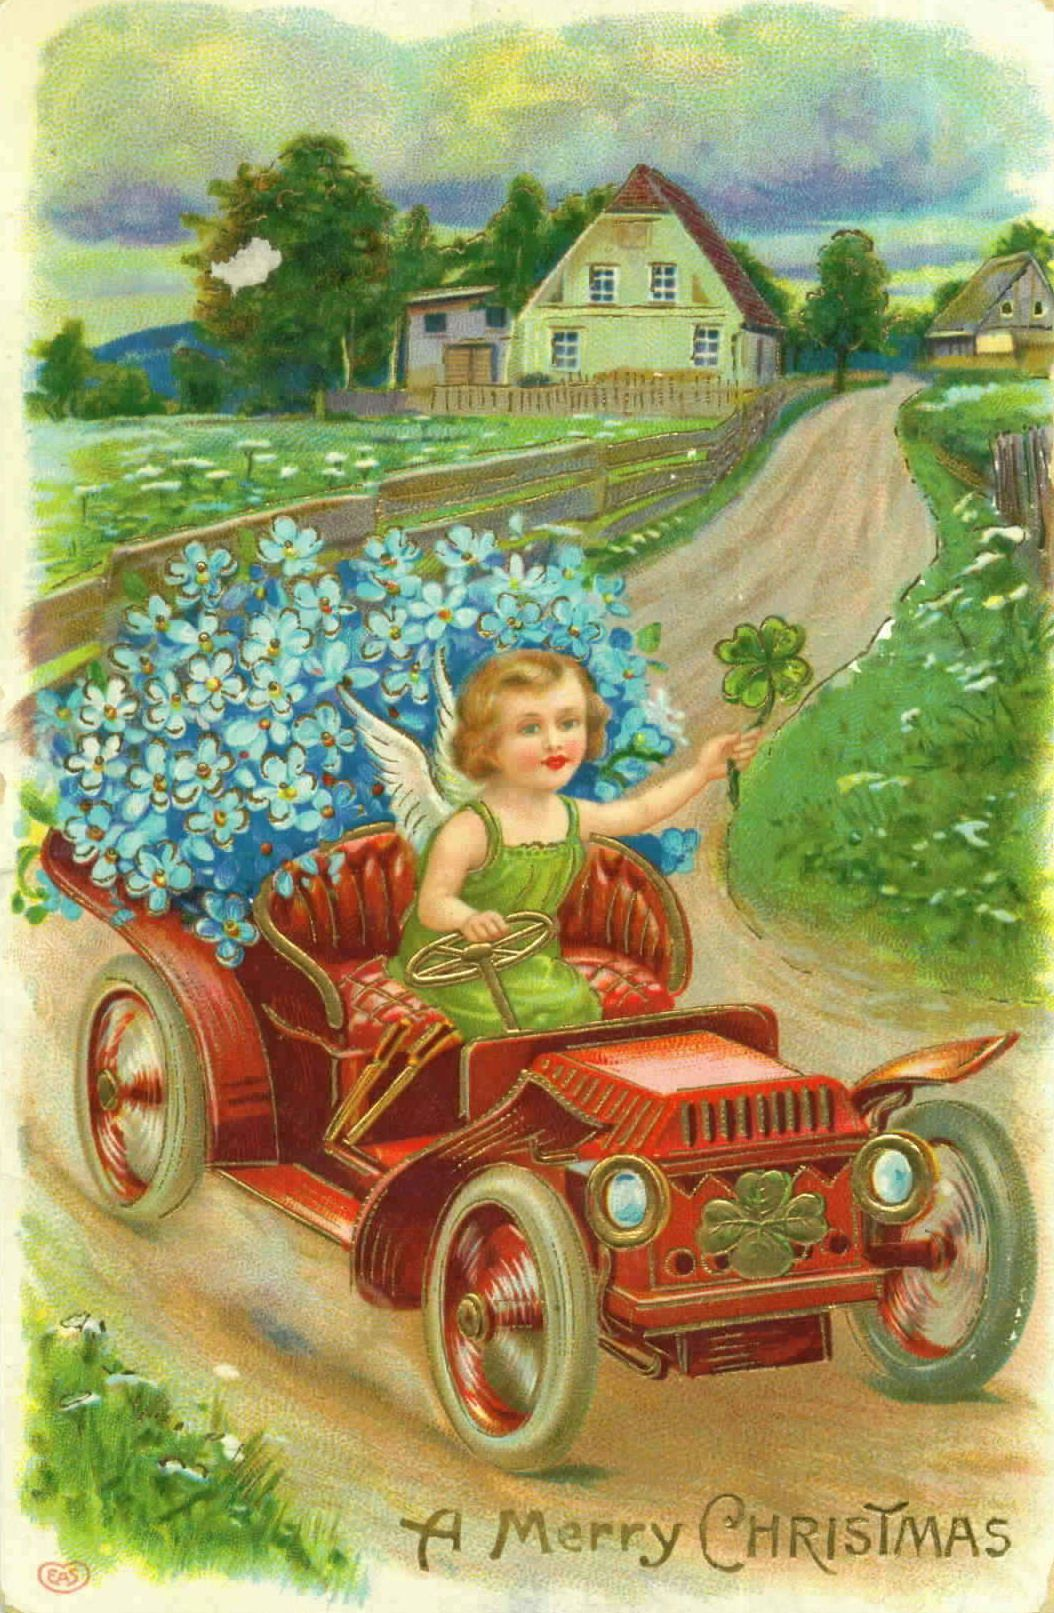 Hiver noel cartes postales anciennes - Cartes de noel anciennes ...